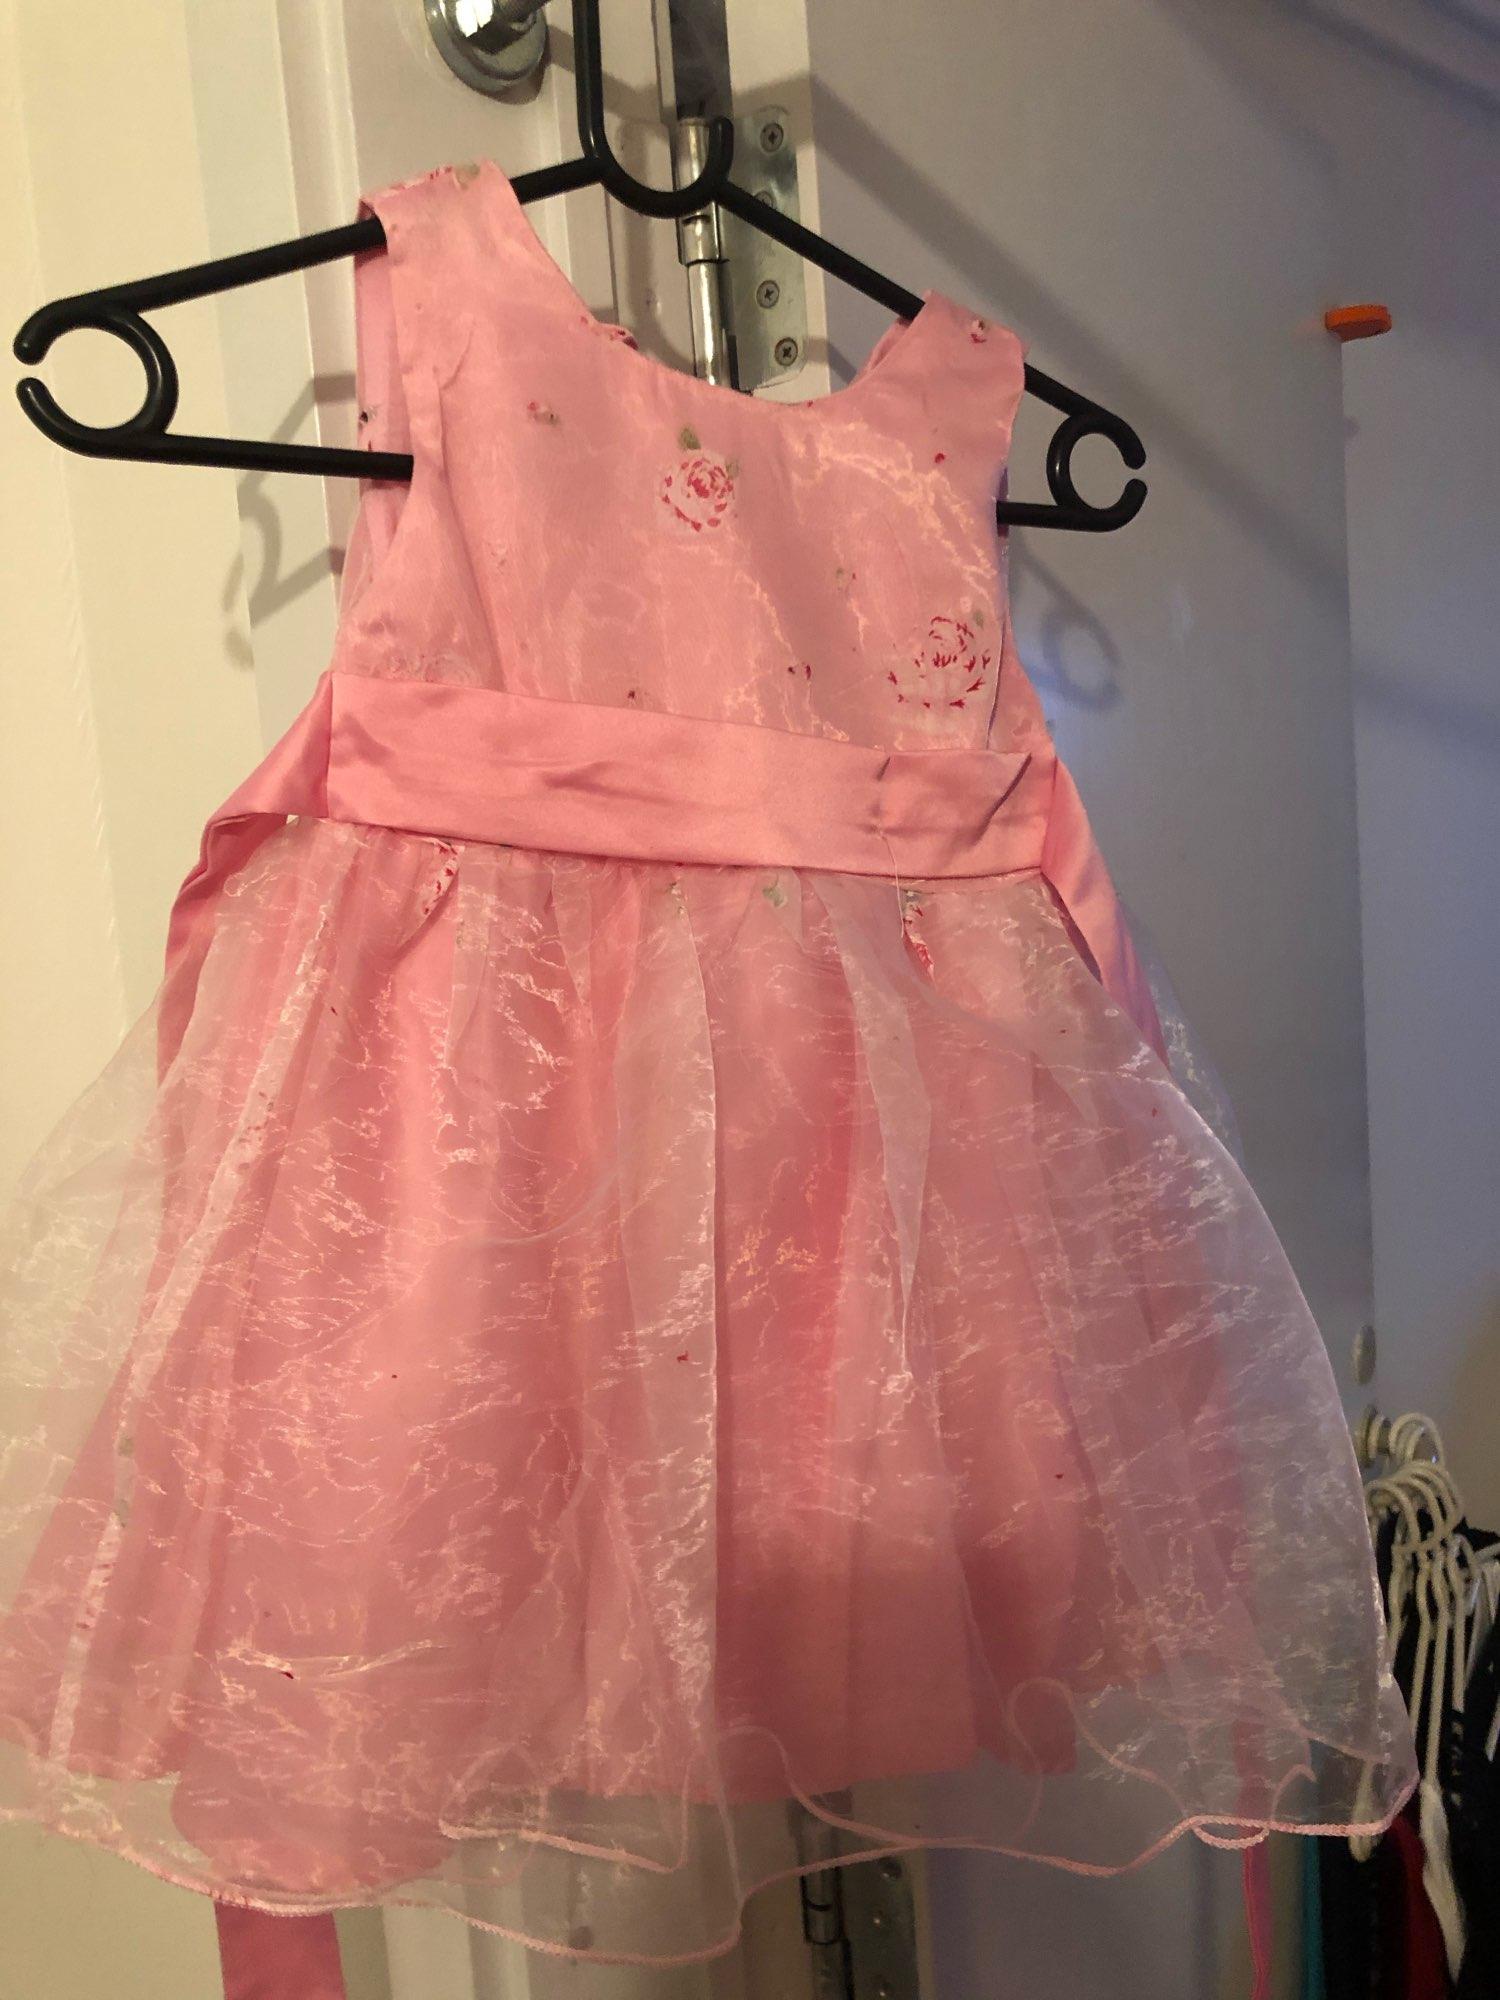 Retail Flower Dress Sashes Wedding Party Girl Dress Floral Print Baby Dress First Communion Kids Dresses Size: 100 150  L619|dress in|dress sizedresses communion dress - AliExpress